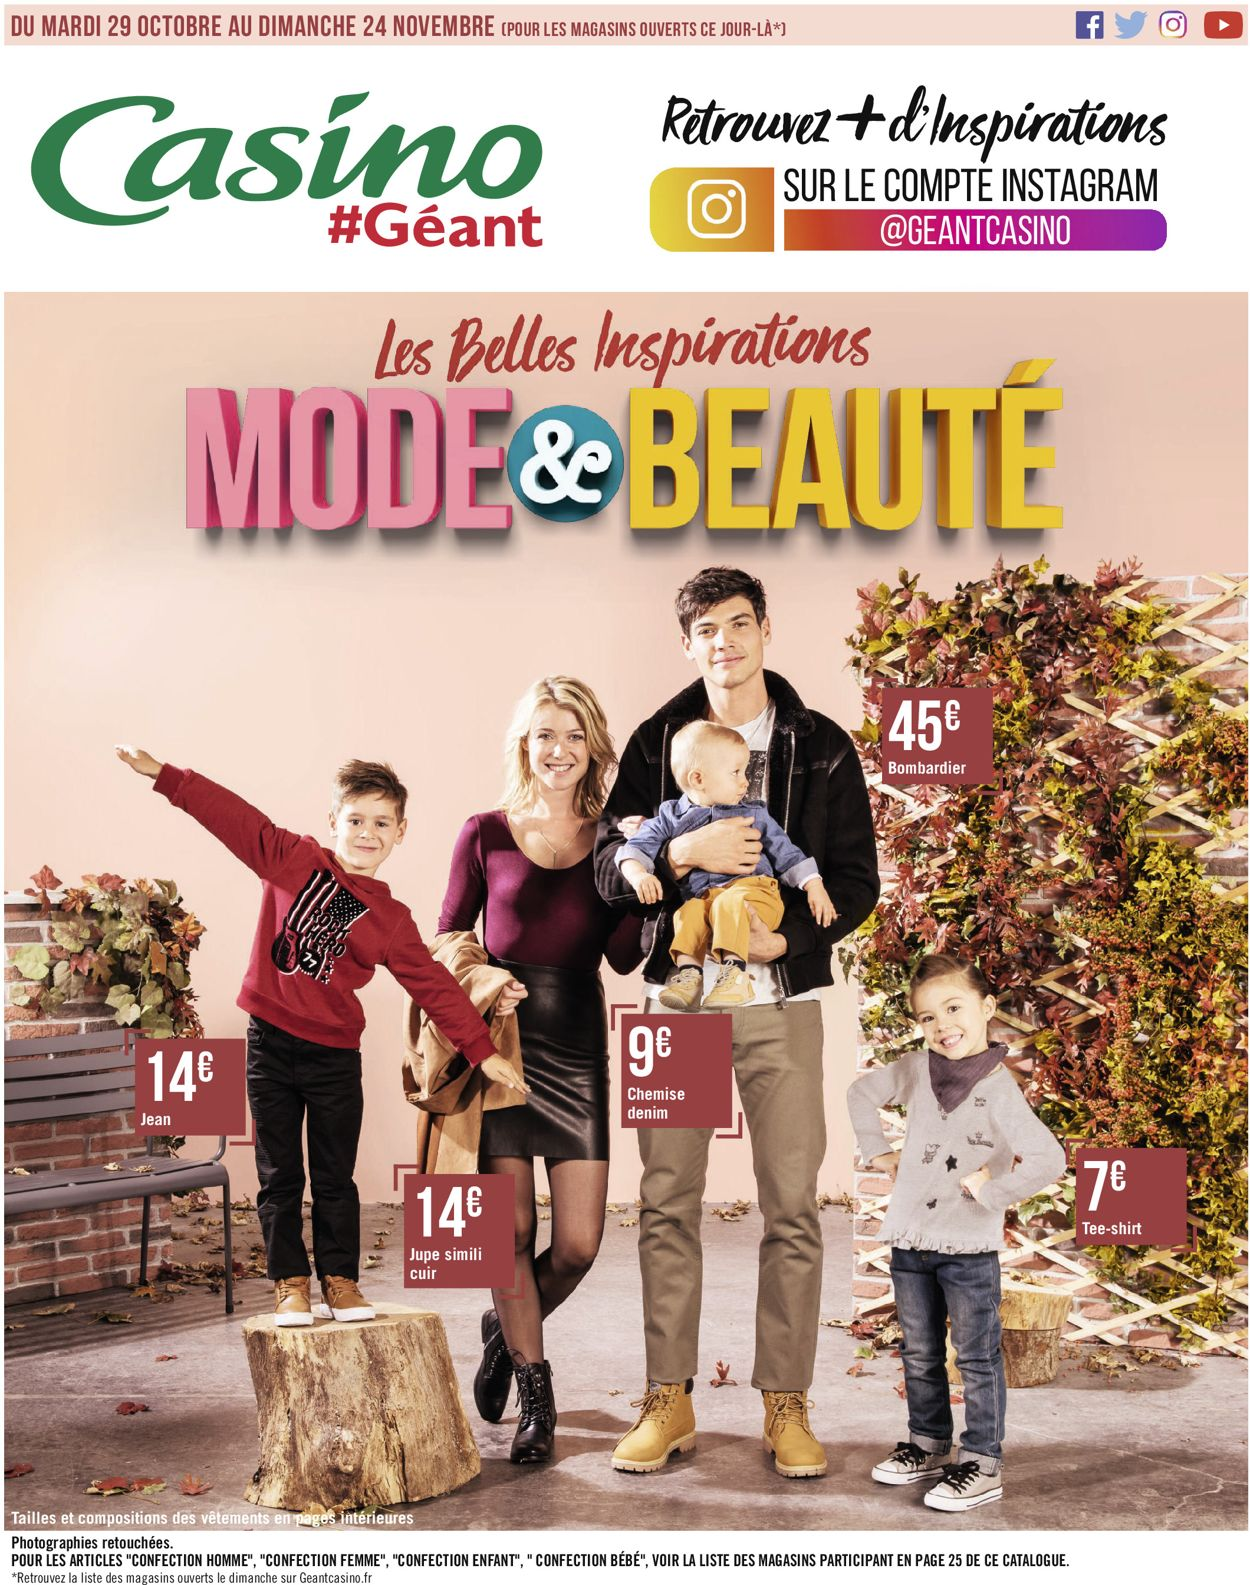 Géant Casino Catalogue - 29.10-24.11.2019